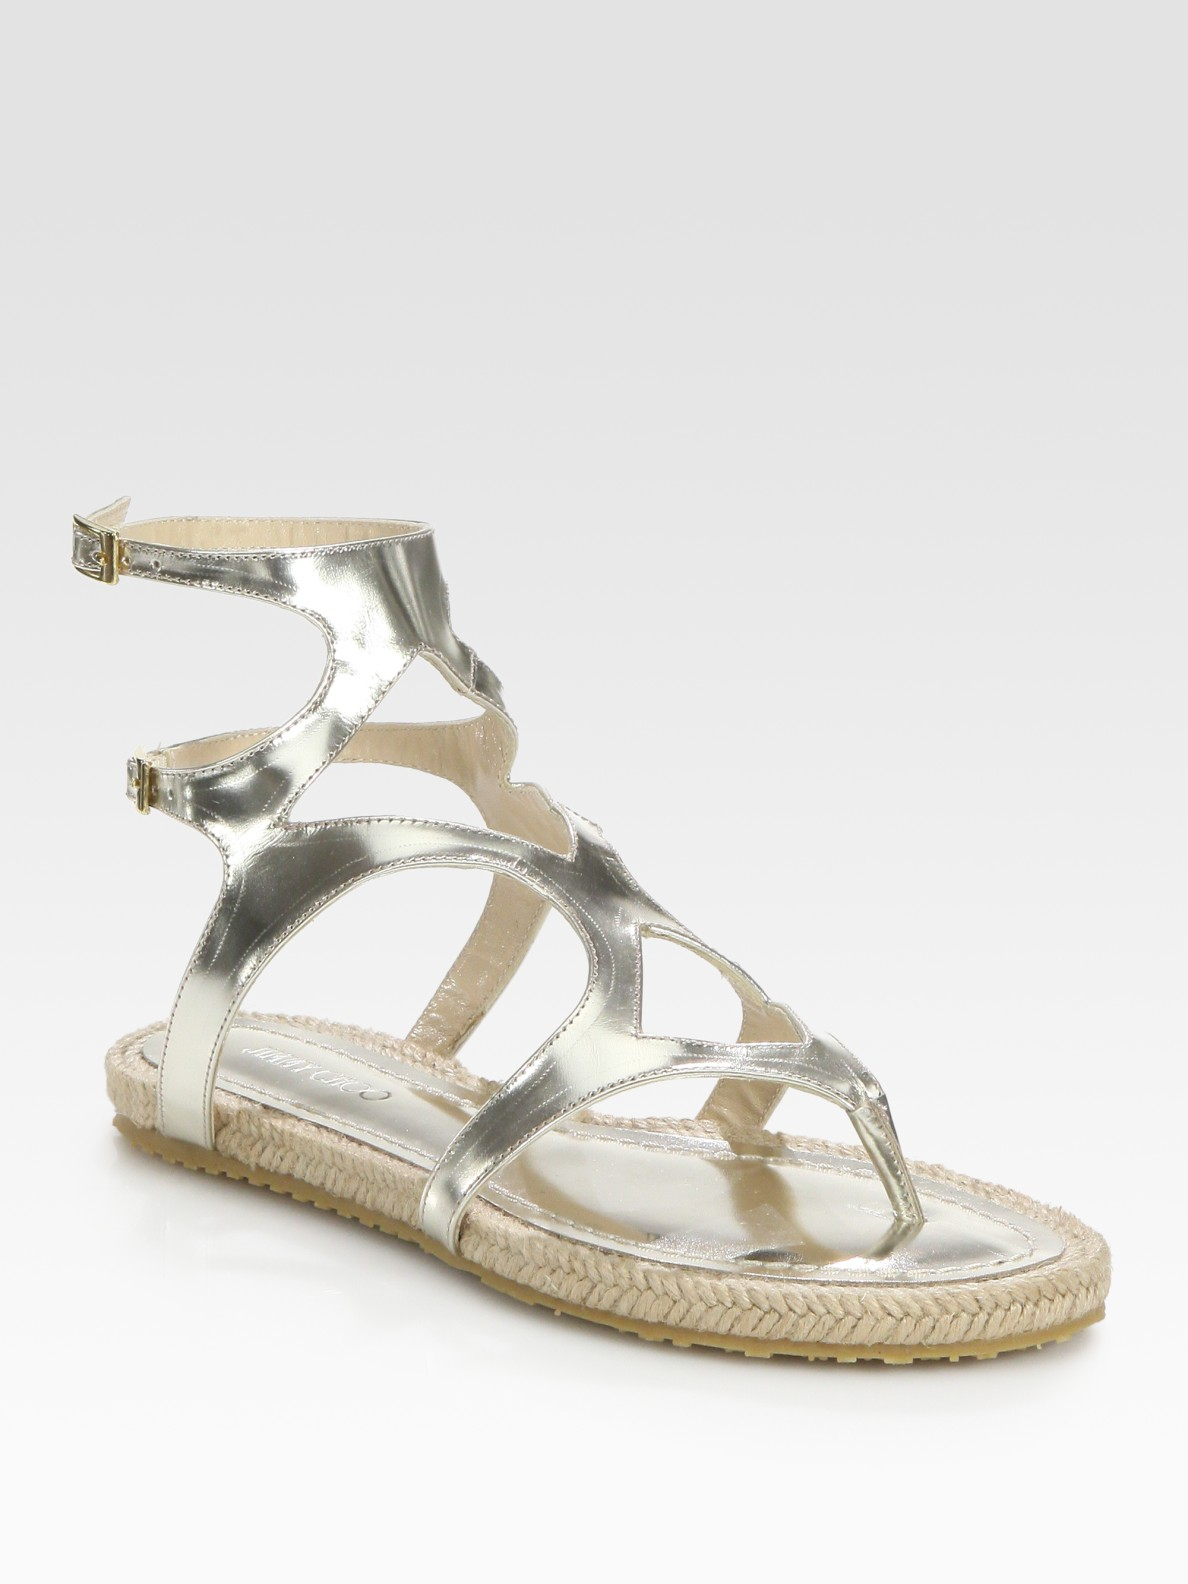 4f4b99fd47dd0 Lyst - Jimmy Choo Peachy Metallic Leather Espadrille Thong Sandals ...